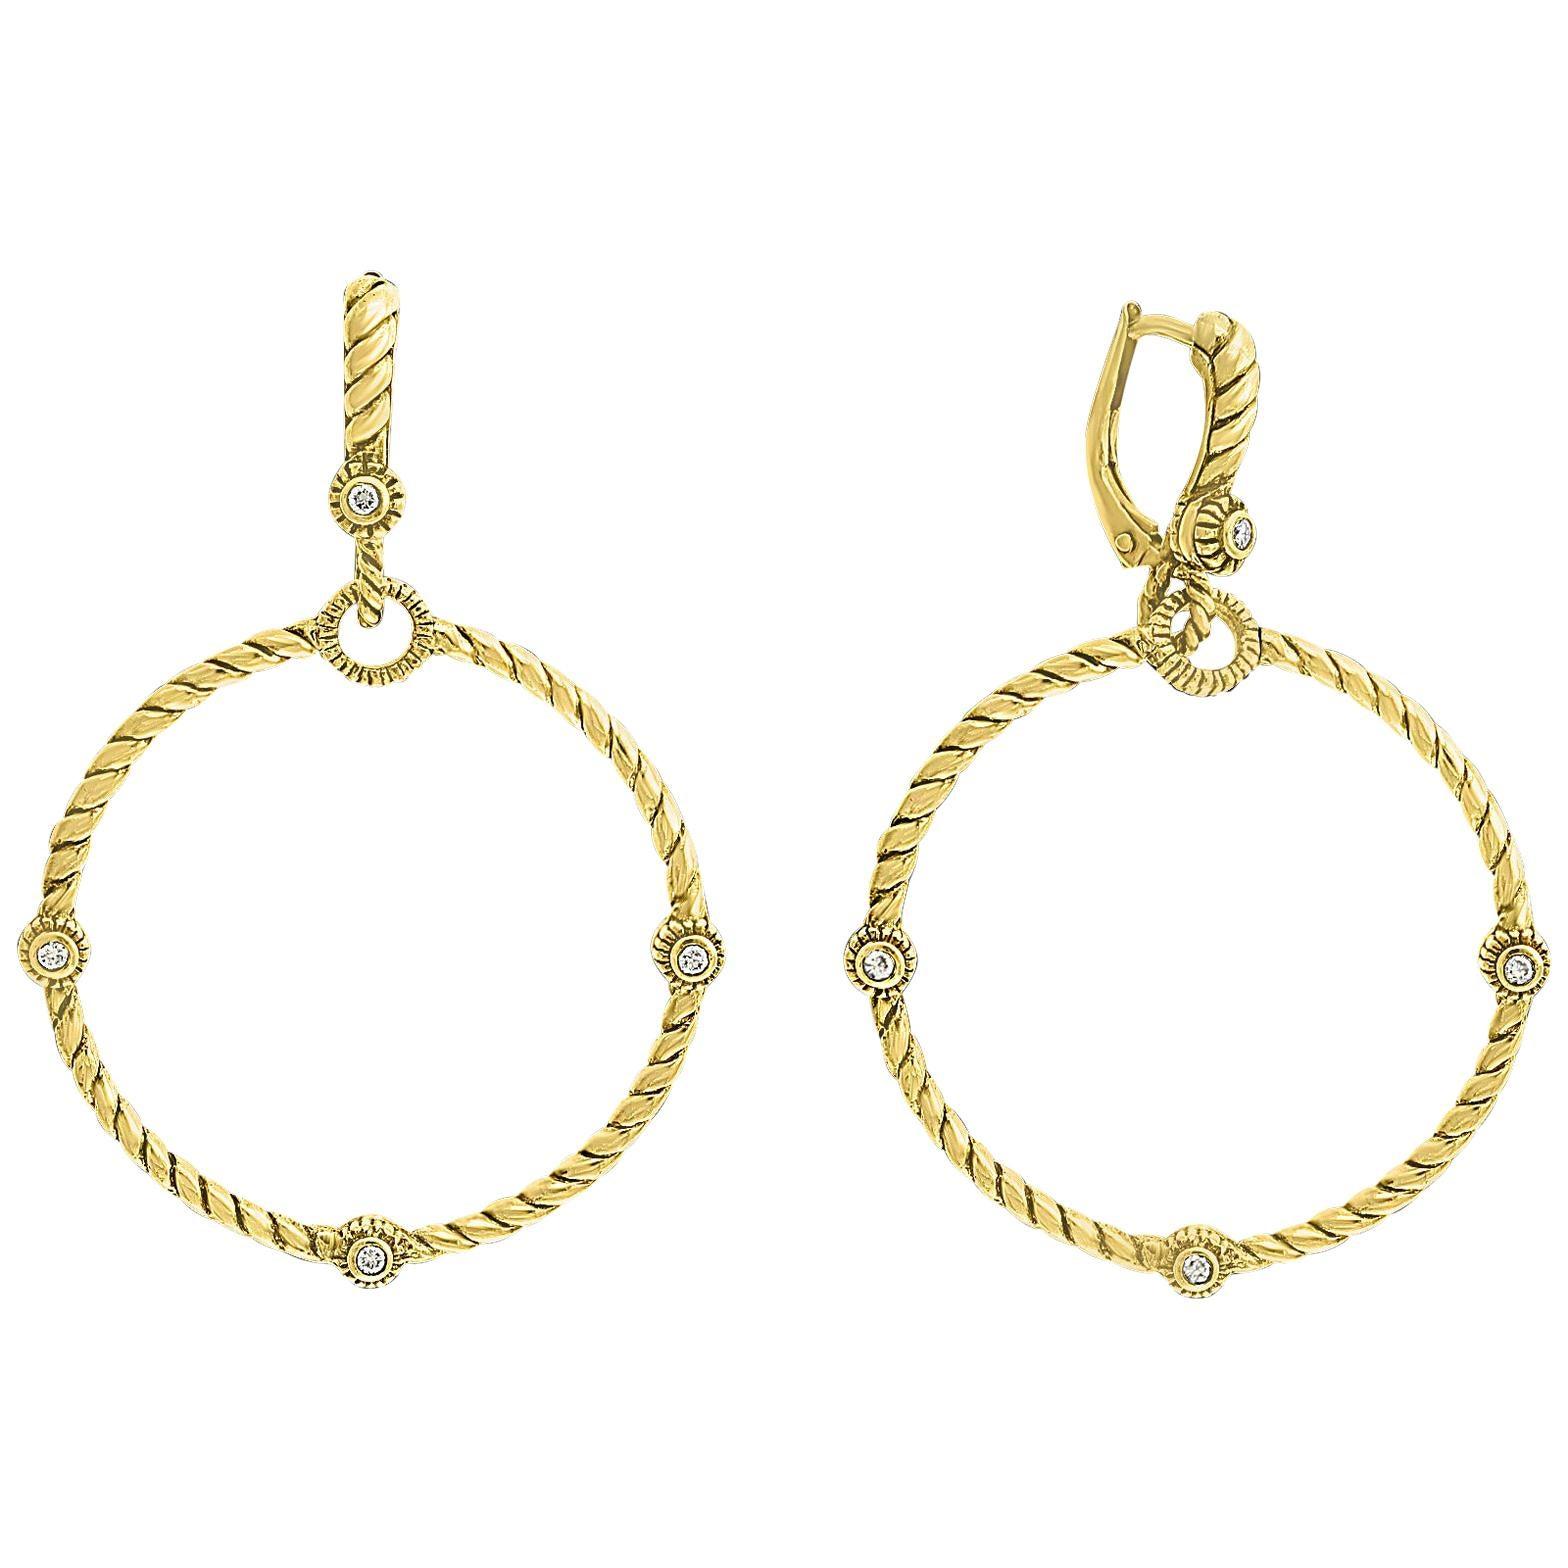 Judith Ripka 18 Karat Yellow Gold Diamond Dangle Chandelier Hoop Earrings